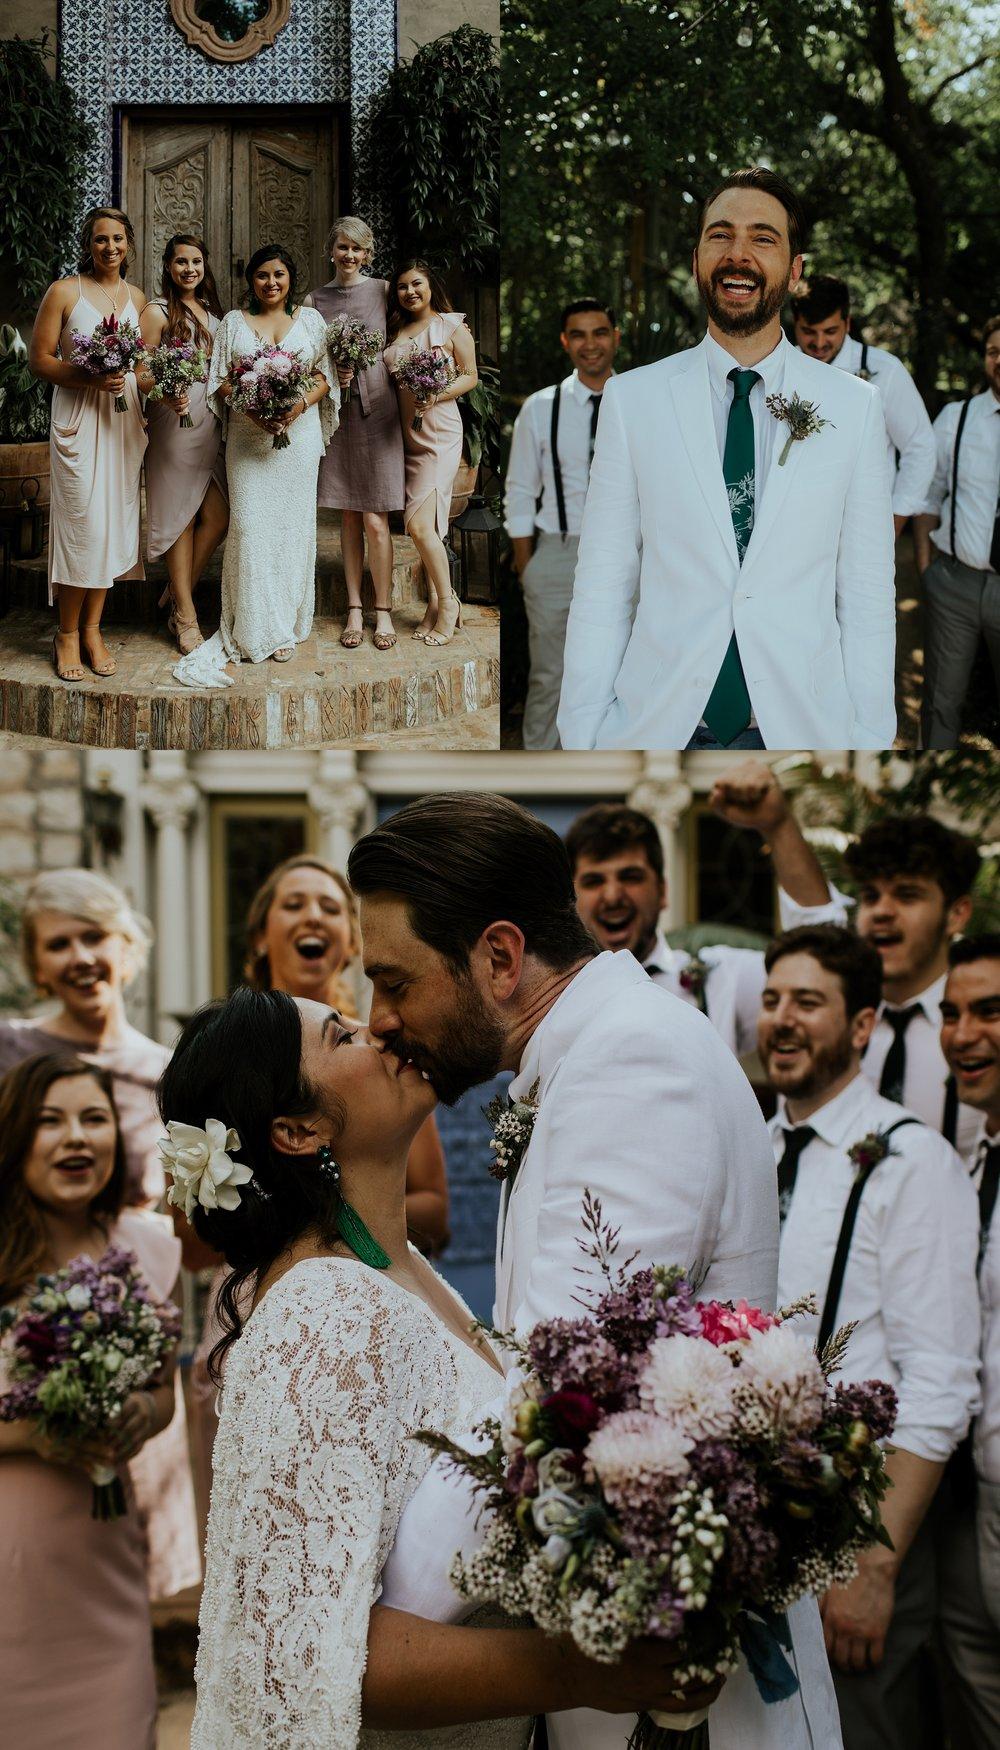 Vibrant Spring Wedding at the enchanting Jennifer's Gardens in Downtown Austin Texas_0024.jpg